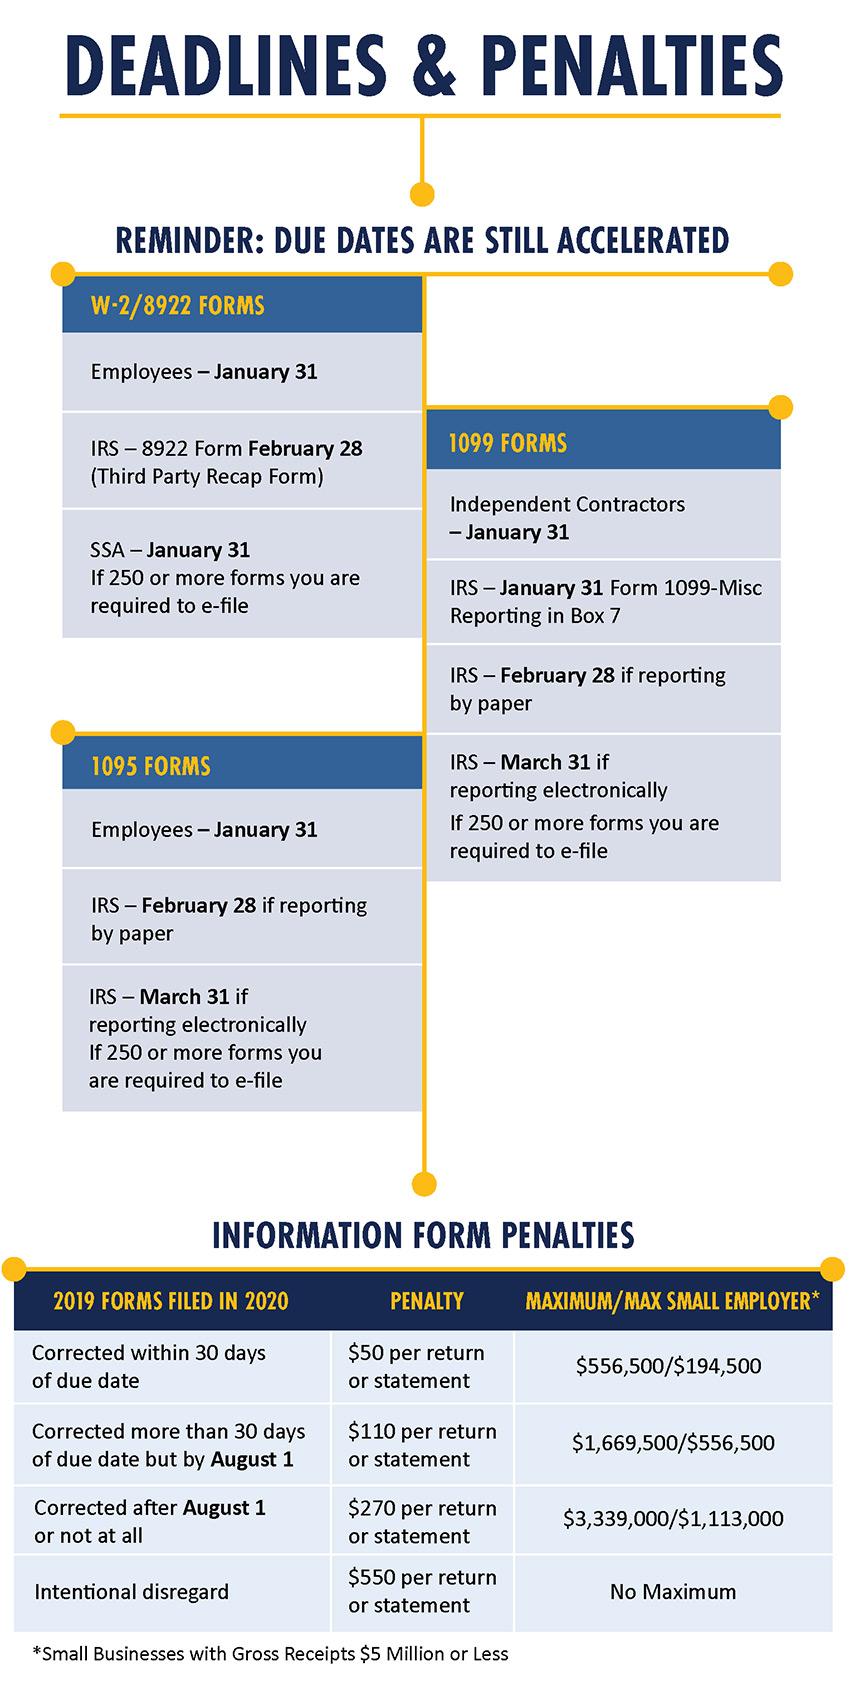 Return Penalties